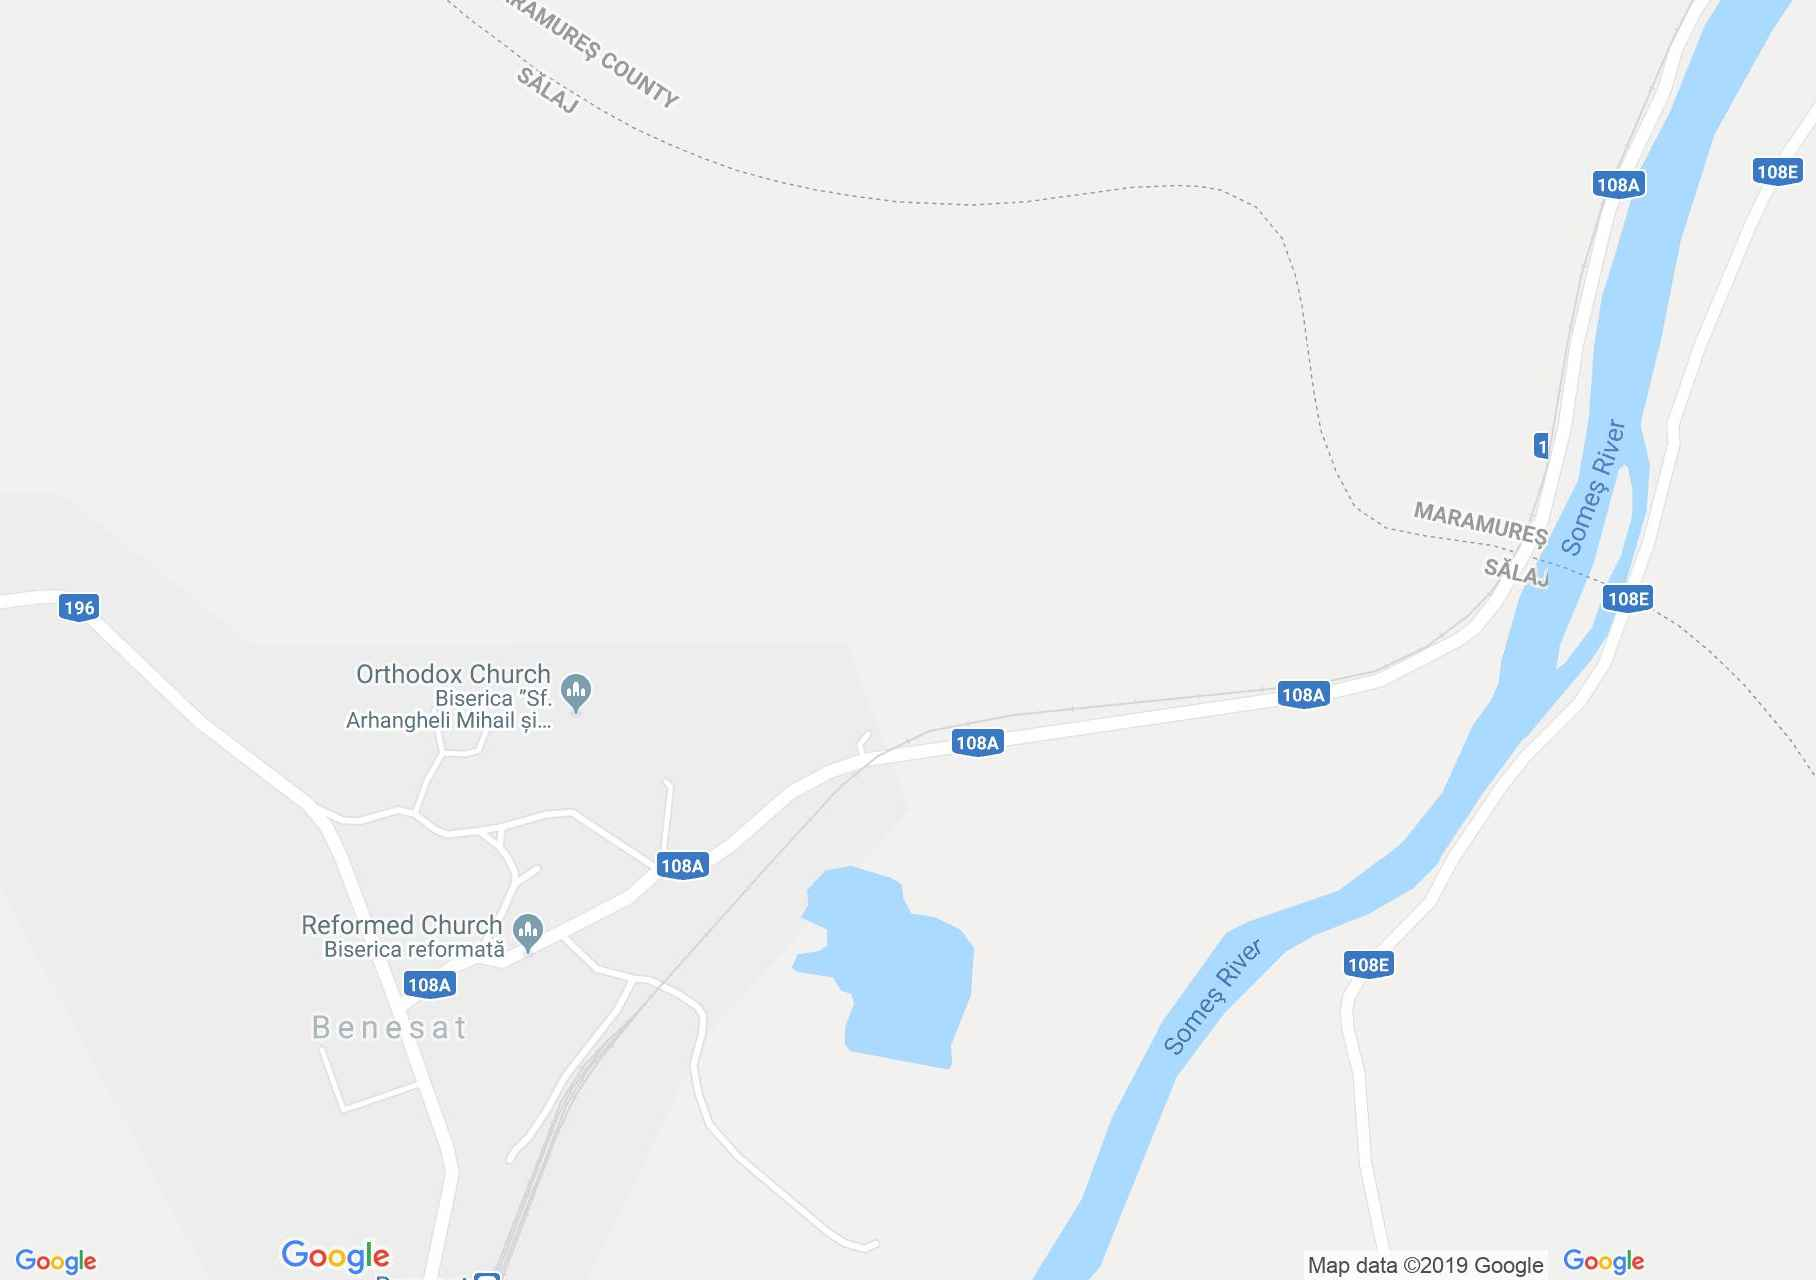 Map of Benesat: The lake